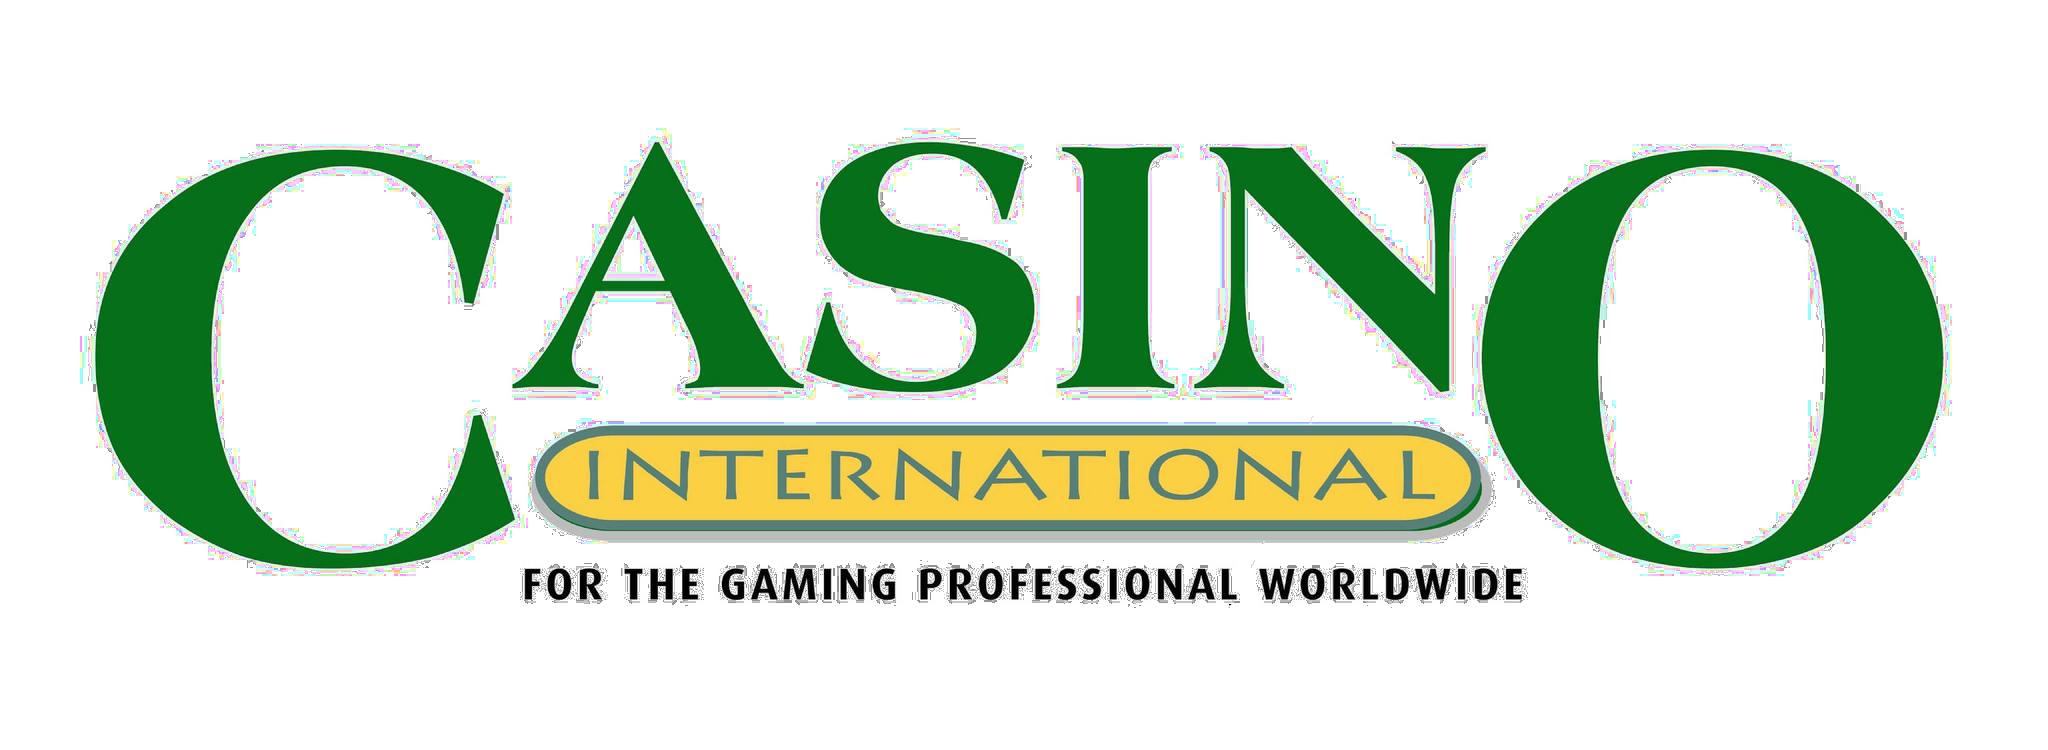 Casino_International_Logo.png